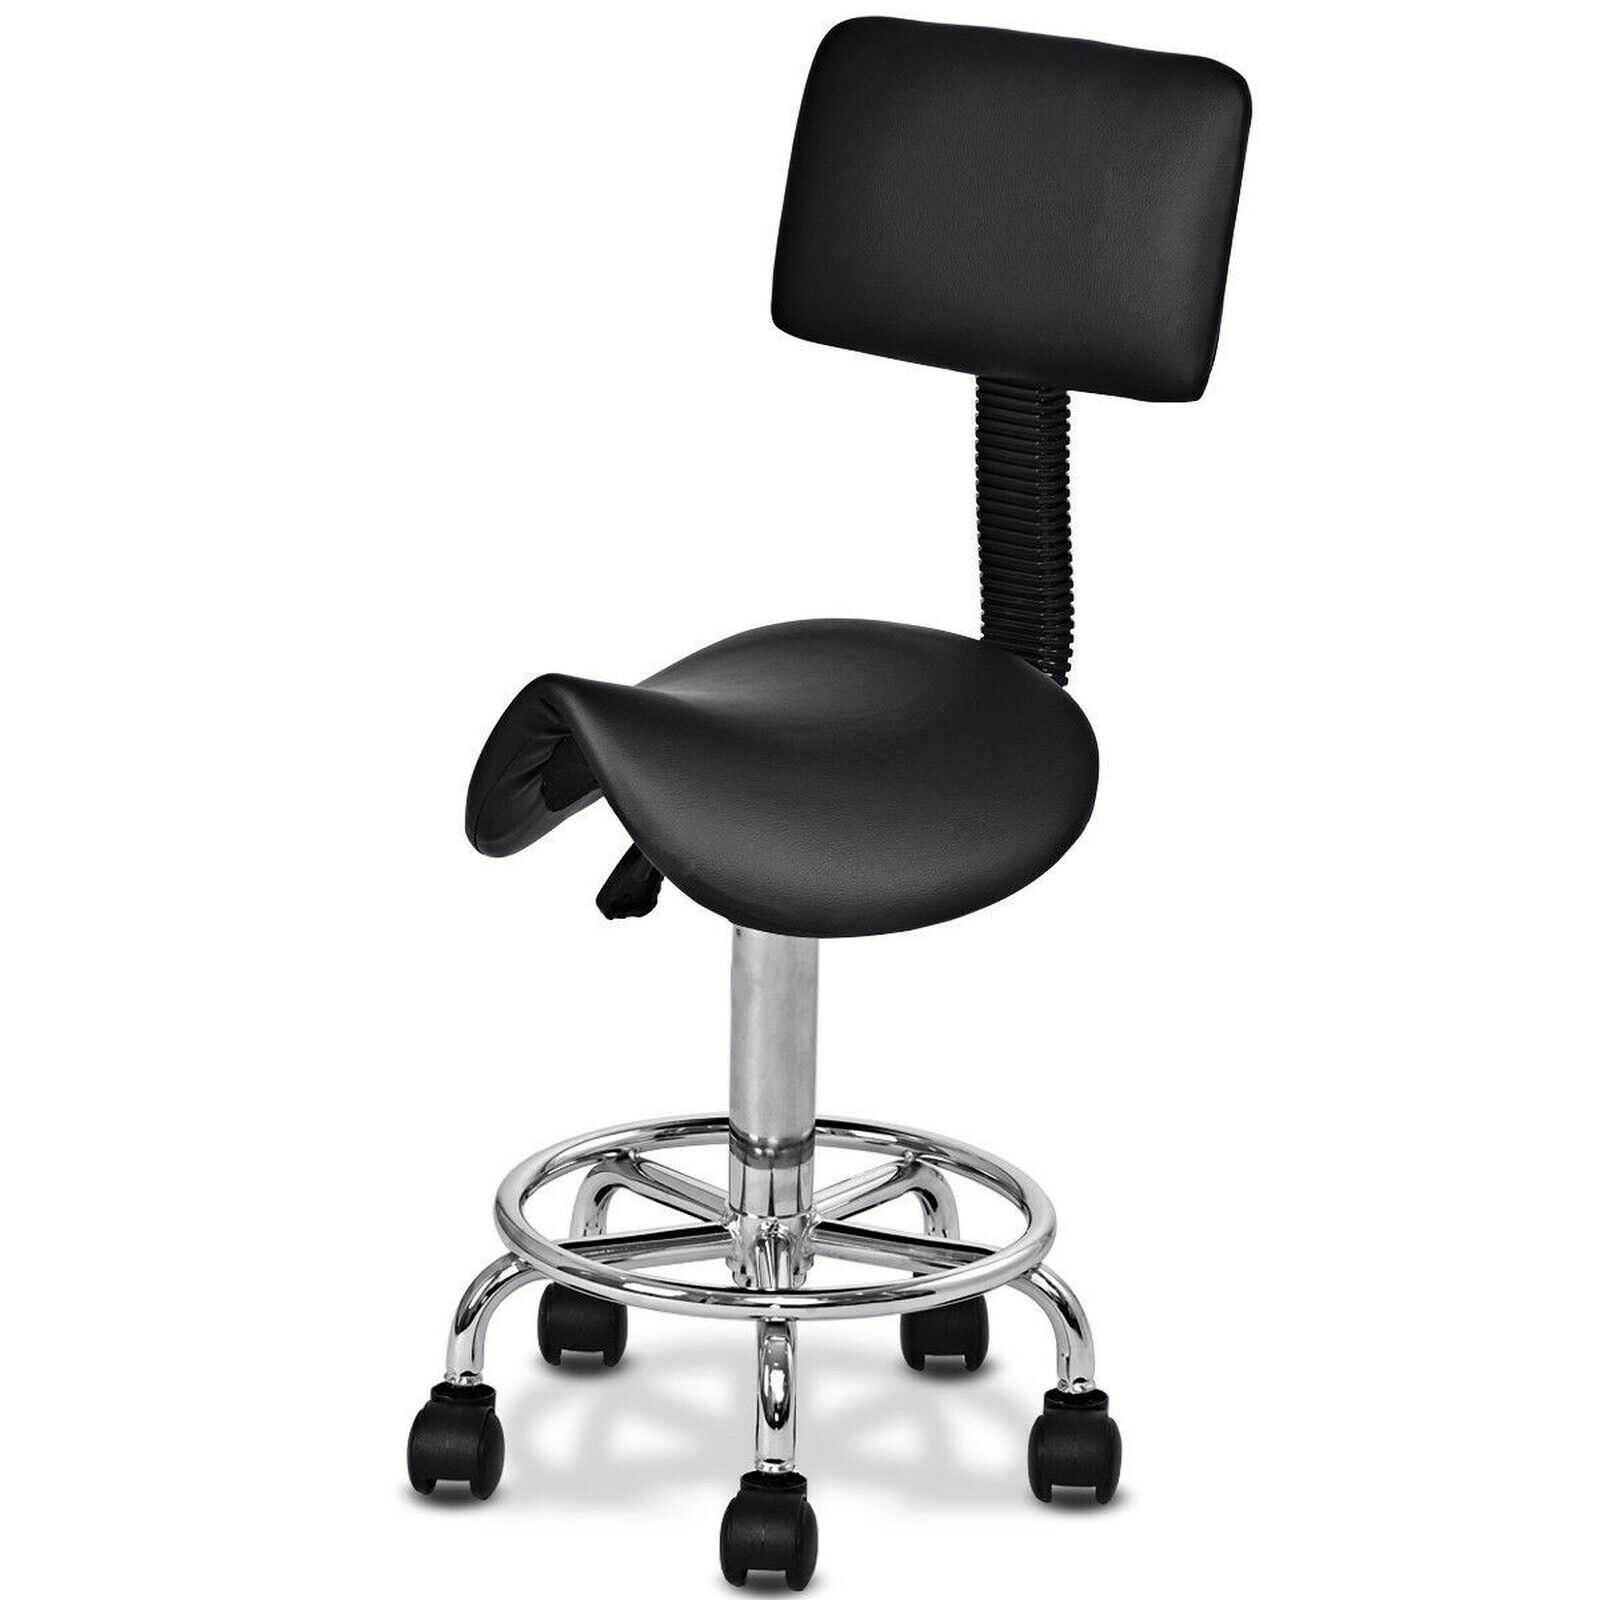 Costway Adjustable Saddle Salon Stool Rolling Massage Chair